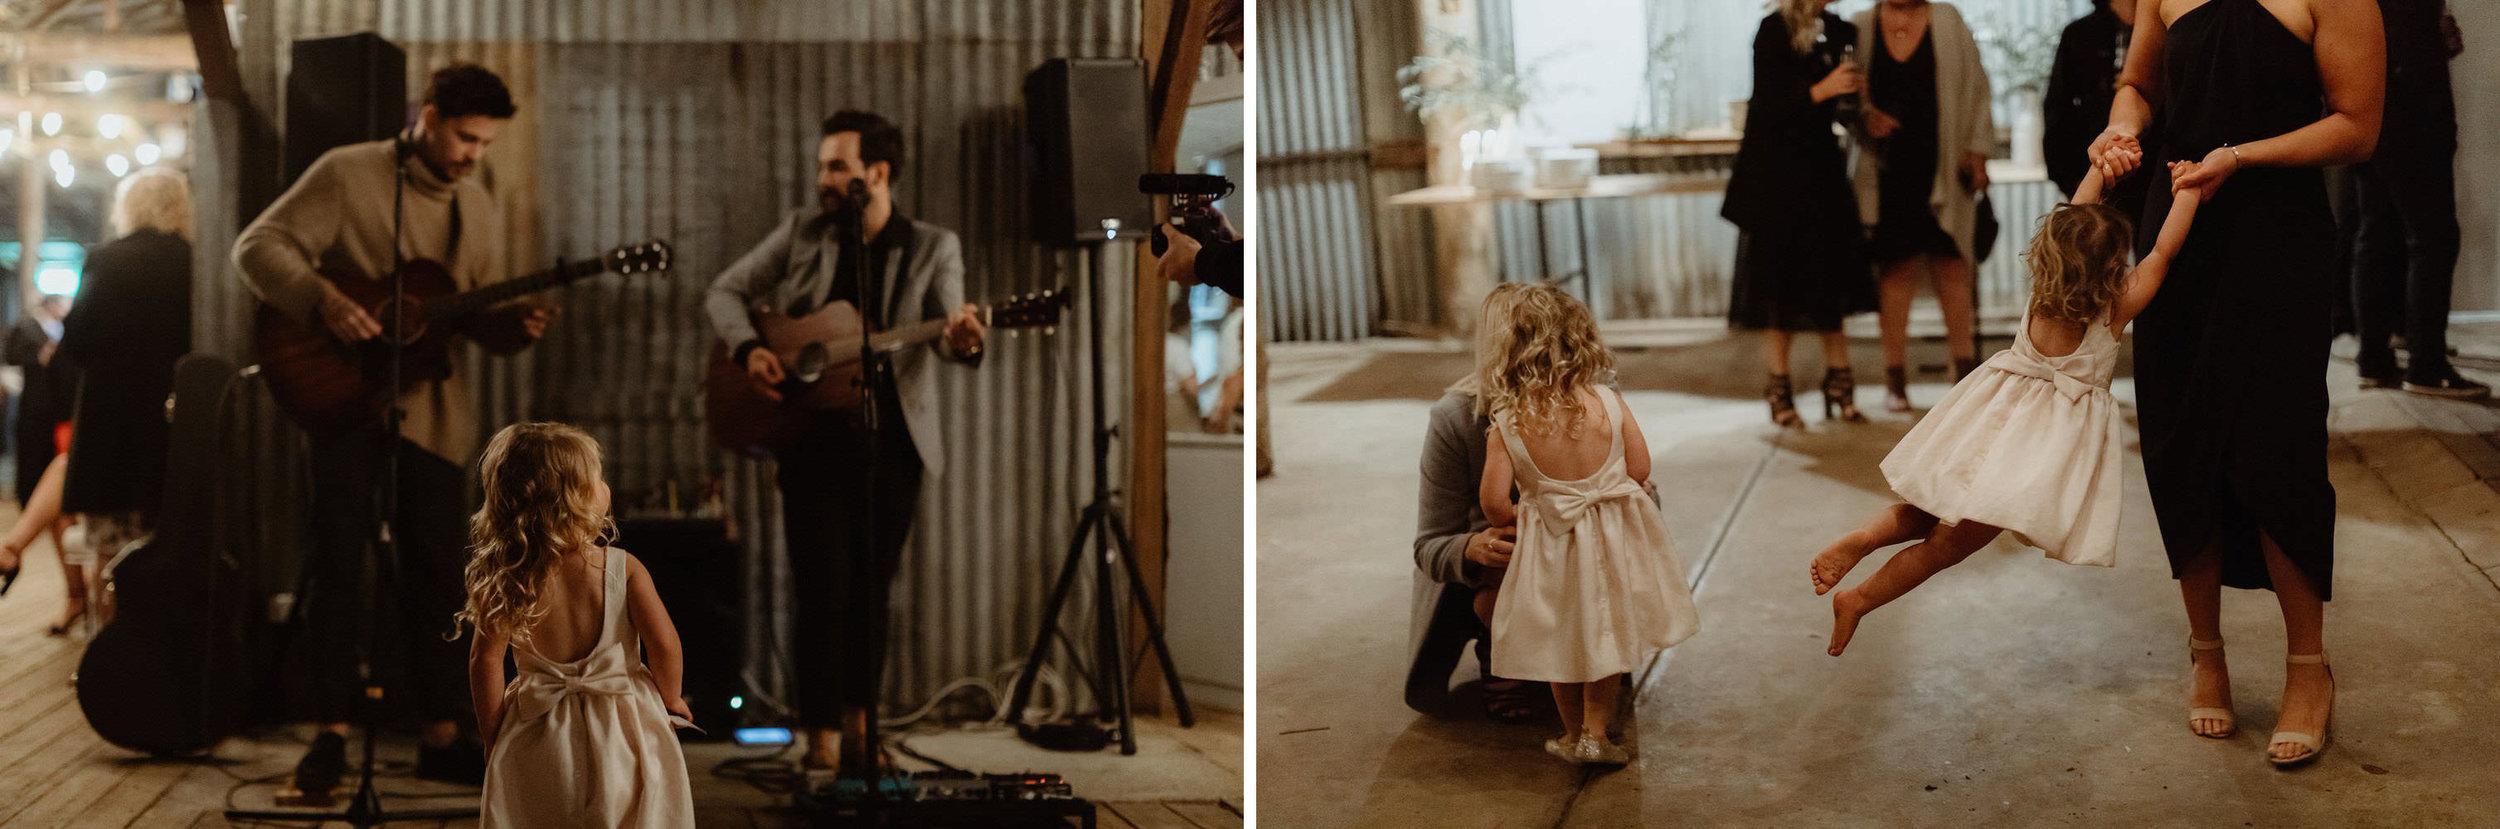 round-hill-homestead-culcairn-wedding-88.jpg